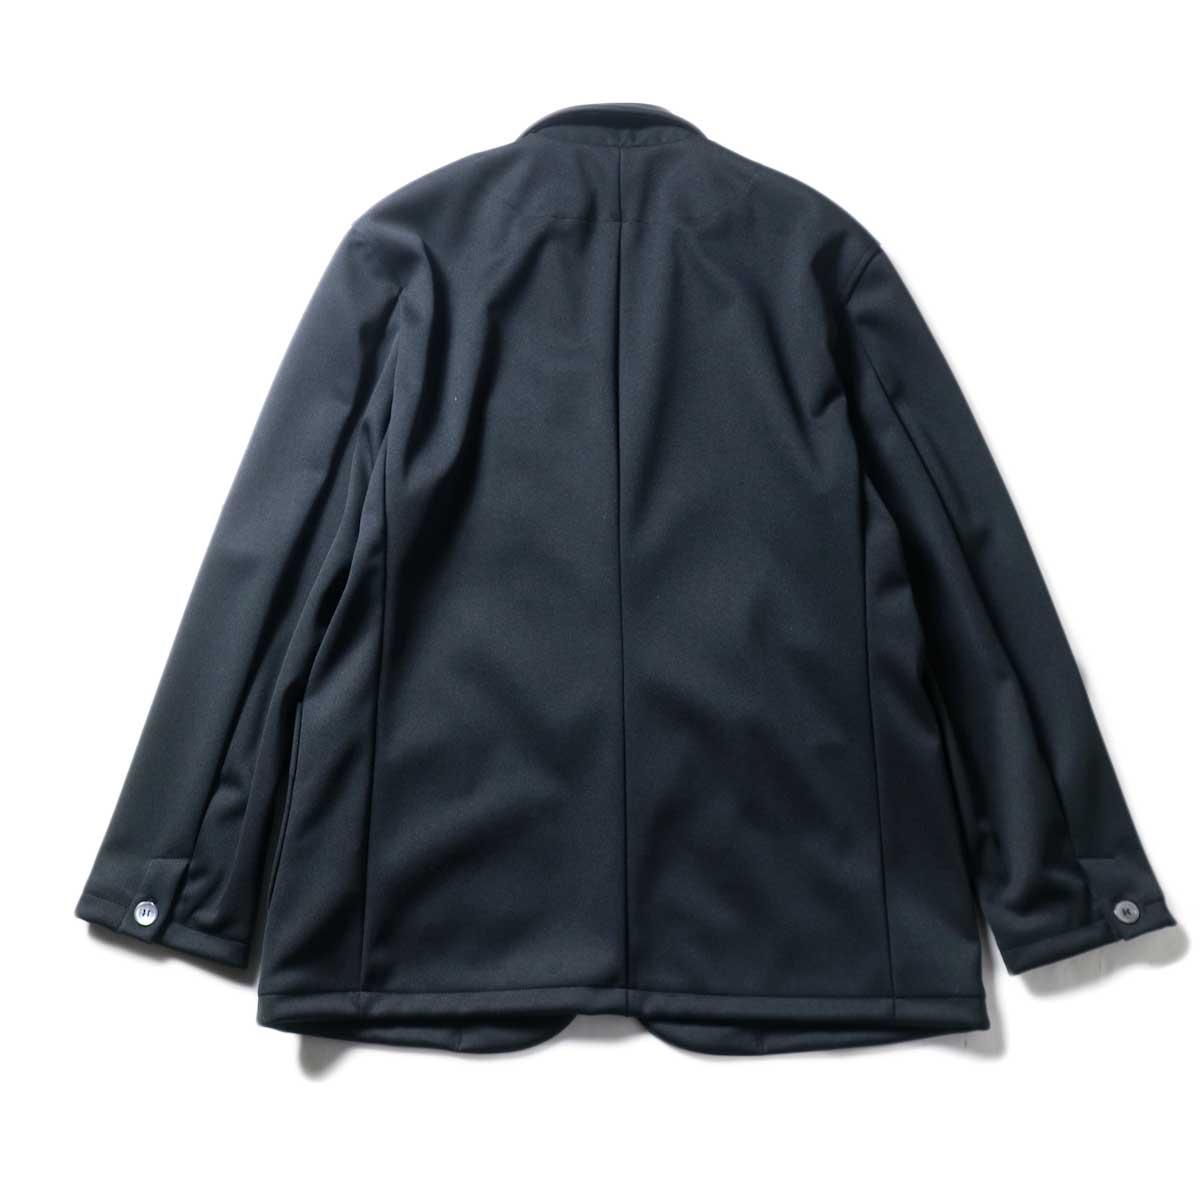 CURLY / TRACK JACKET (Black)背面